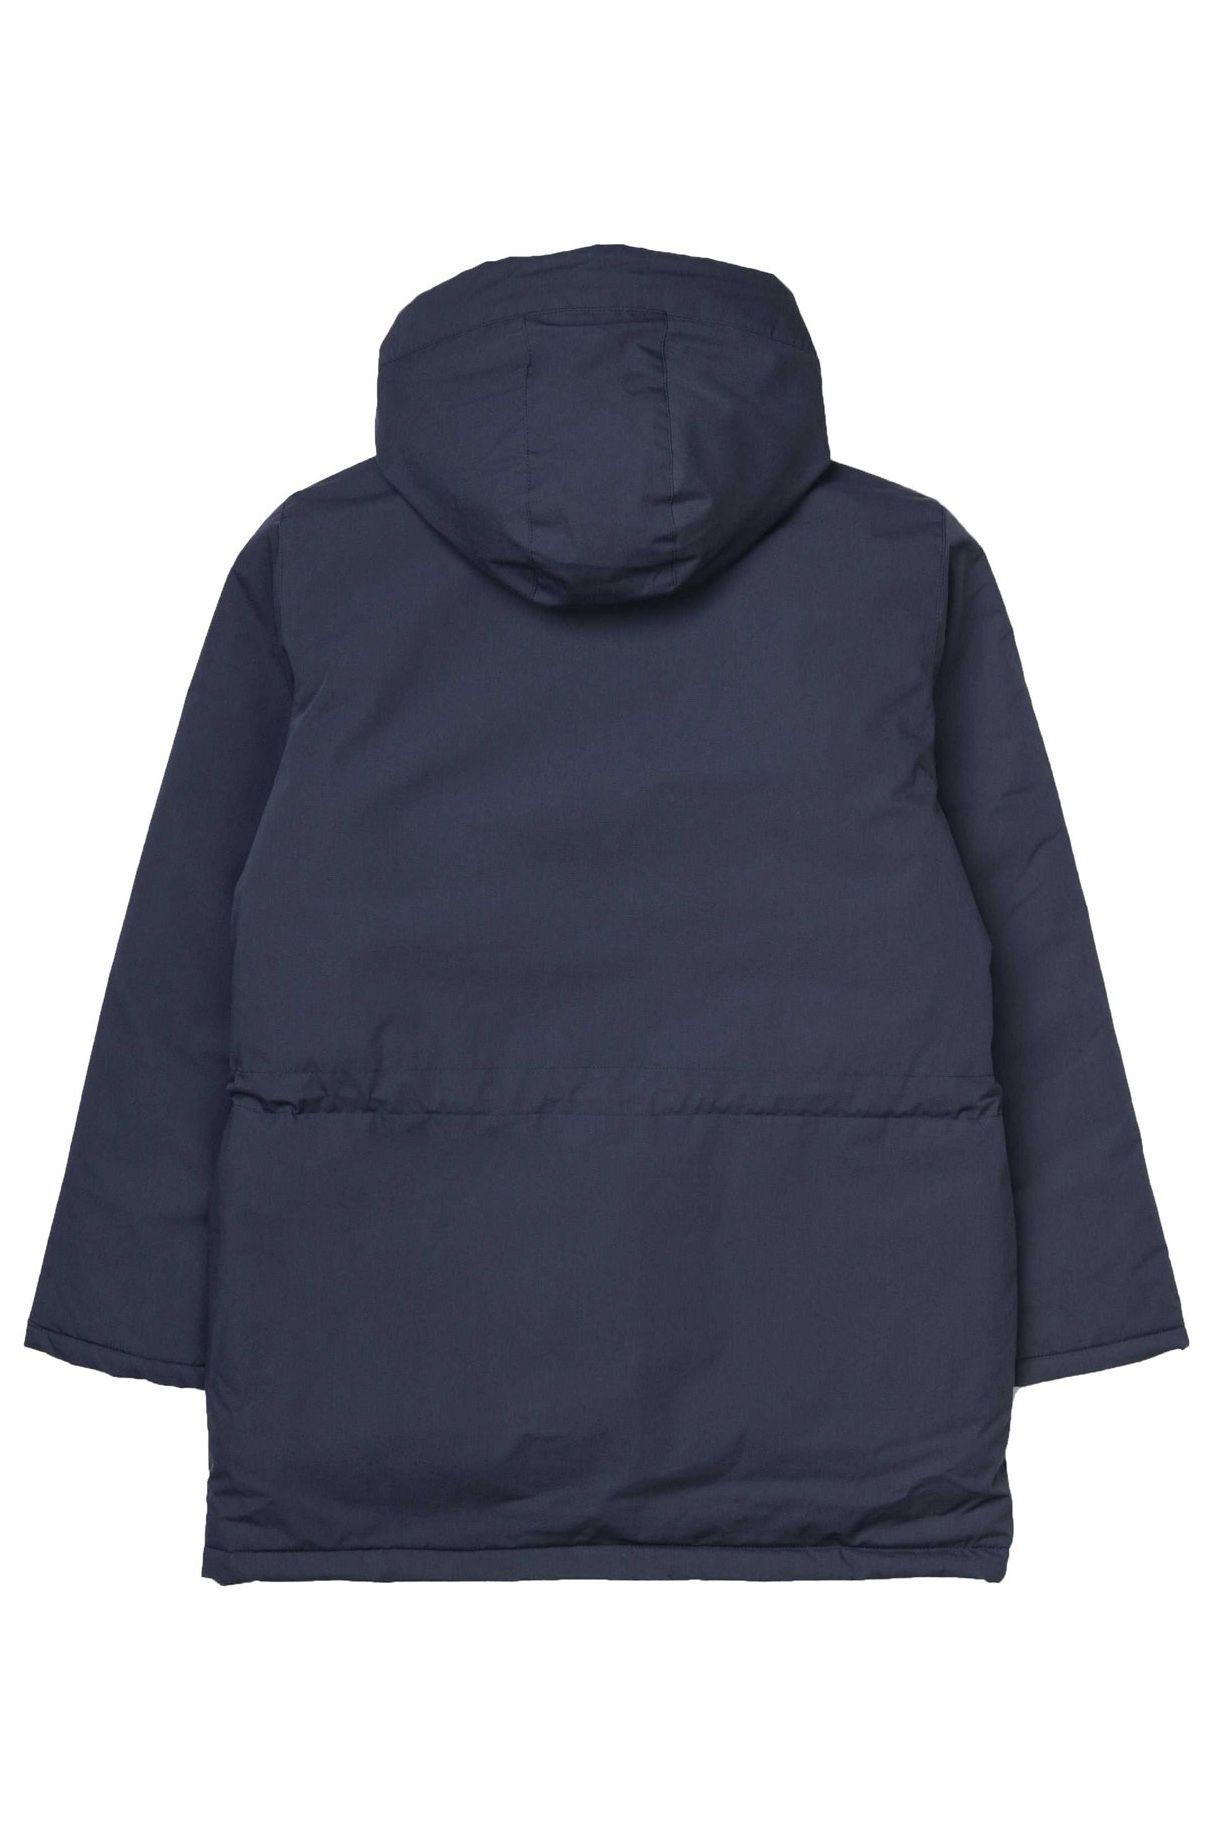 Blusão Carhartt WIP TROPPER PARKA Blue